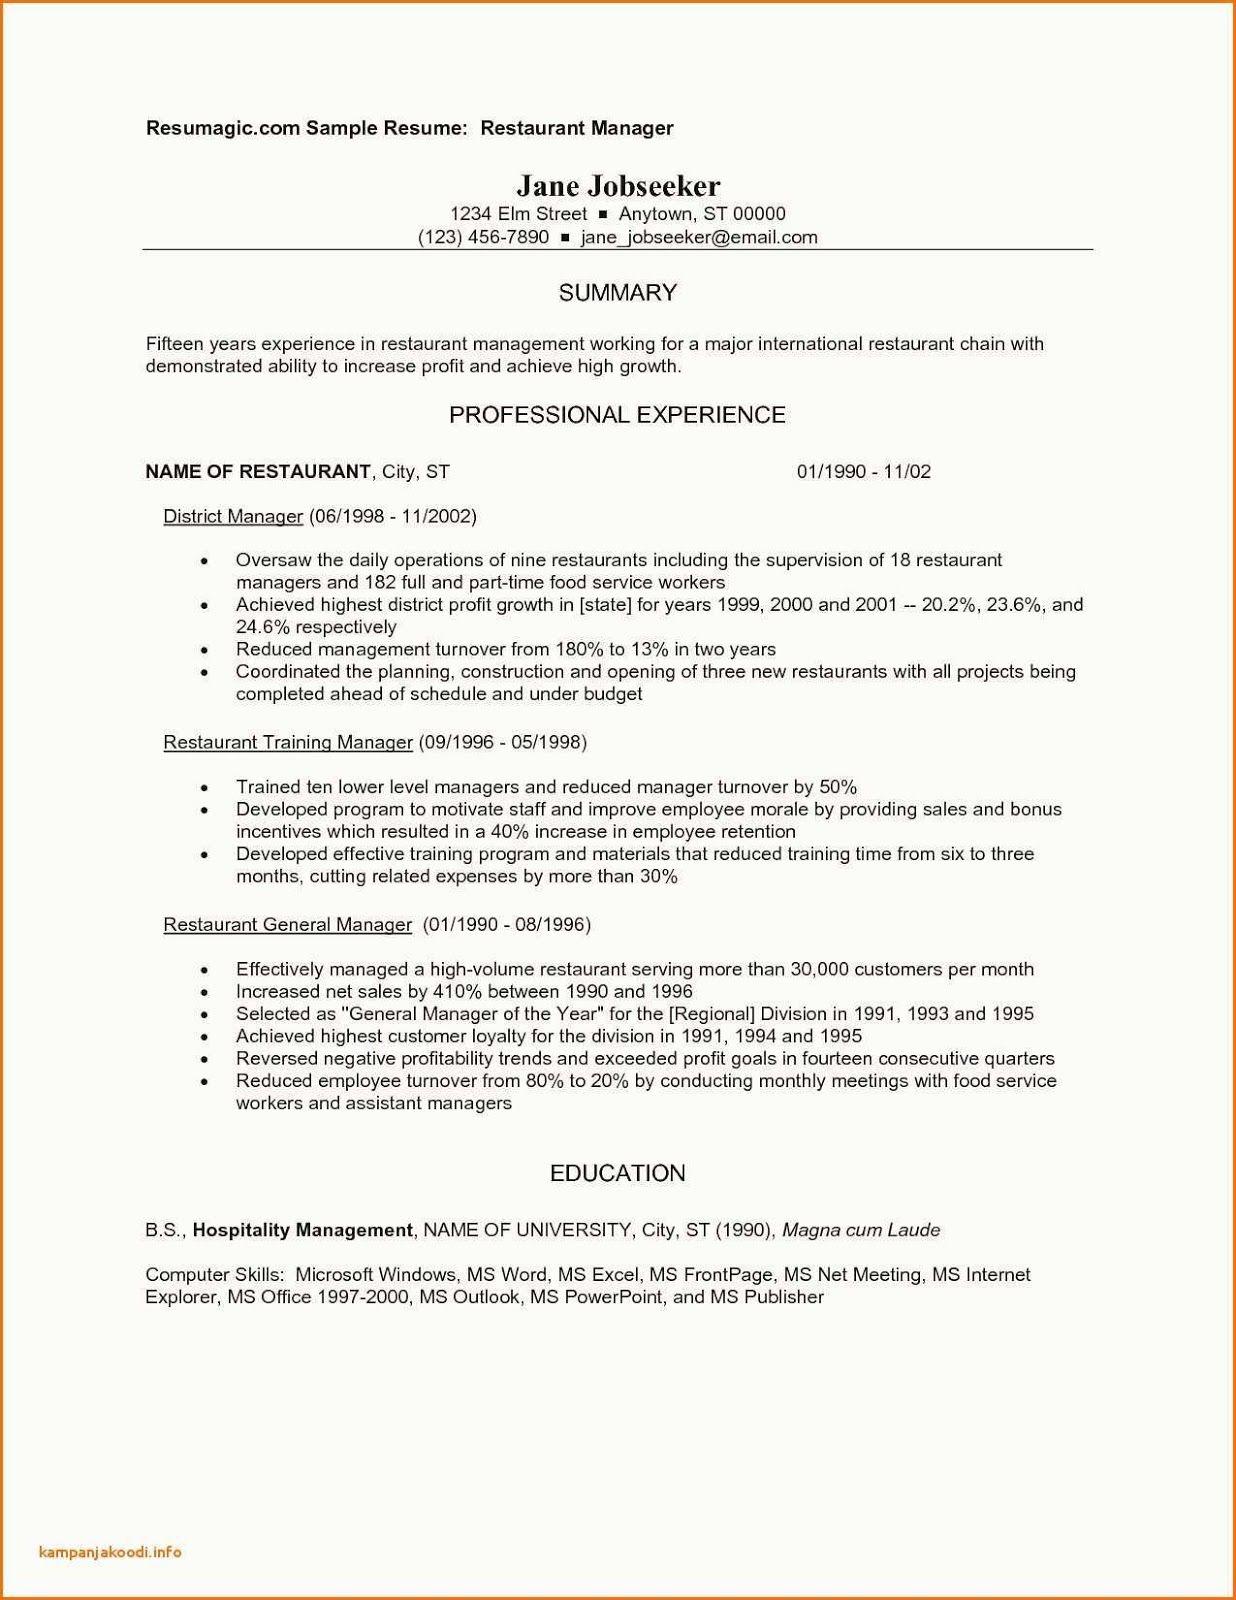 Academic resume sample academic resume sample pdf